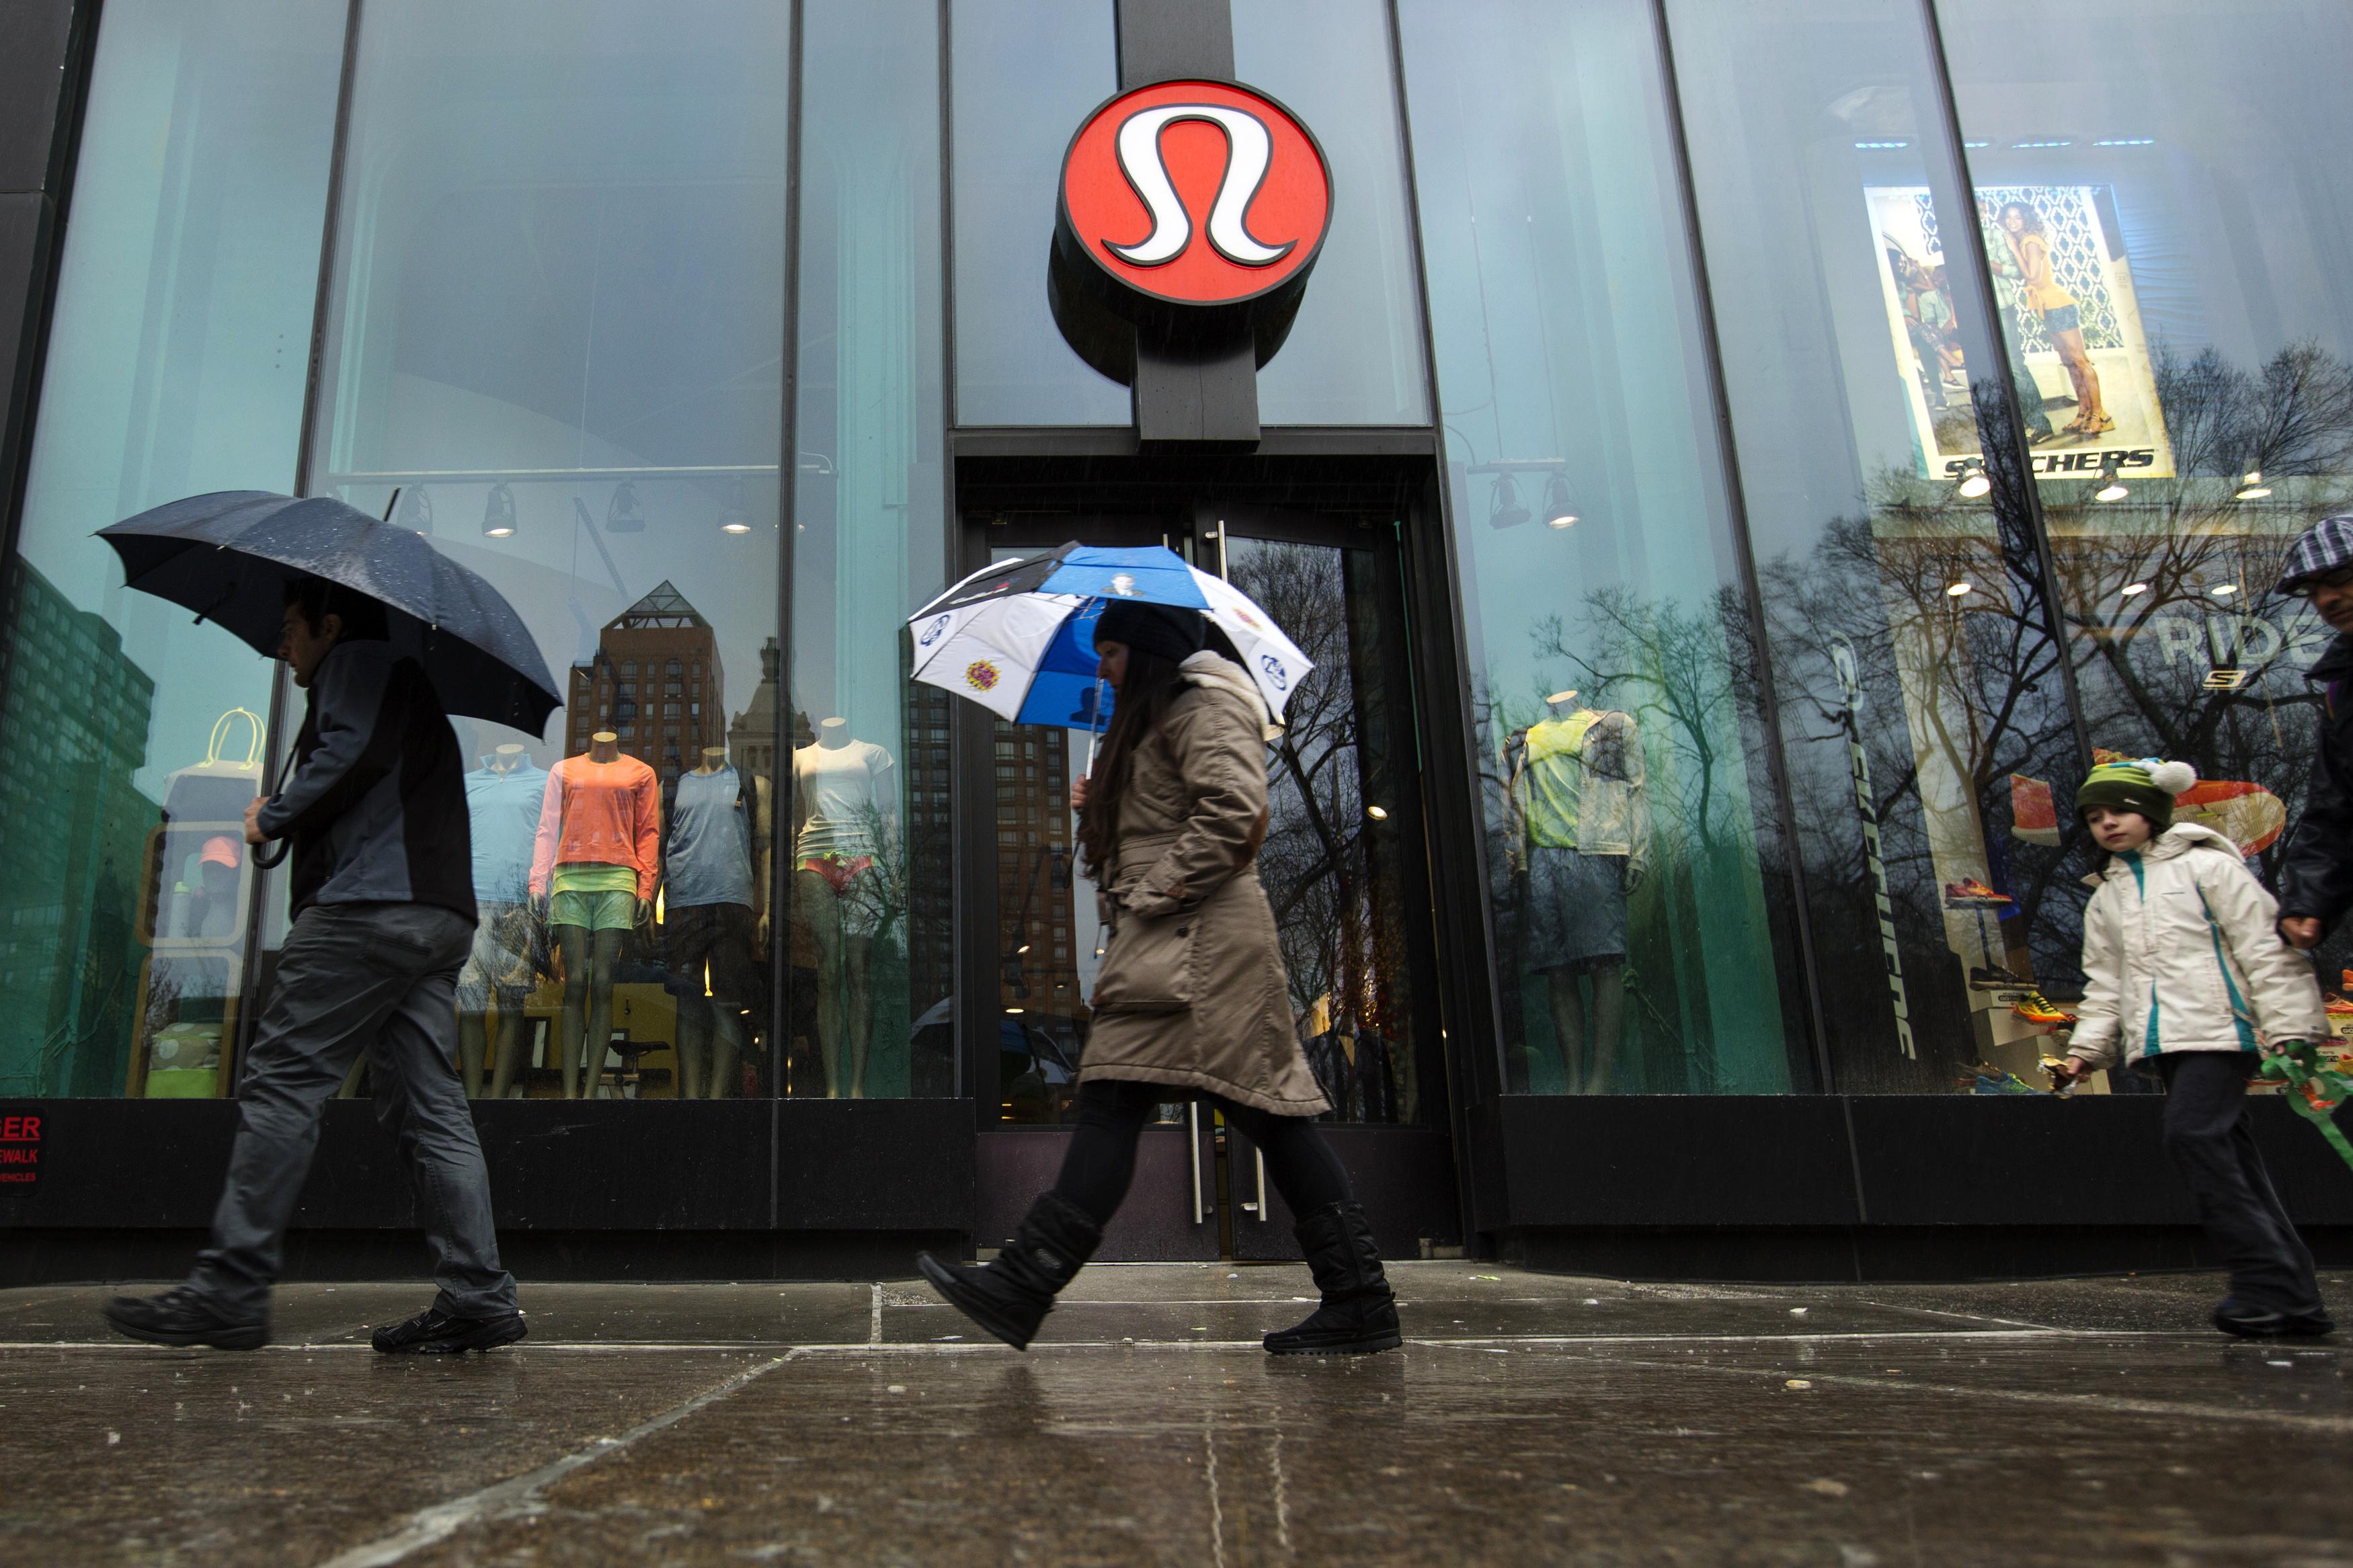 Pedestrians walk past a Lululemon Athletica store in New York